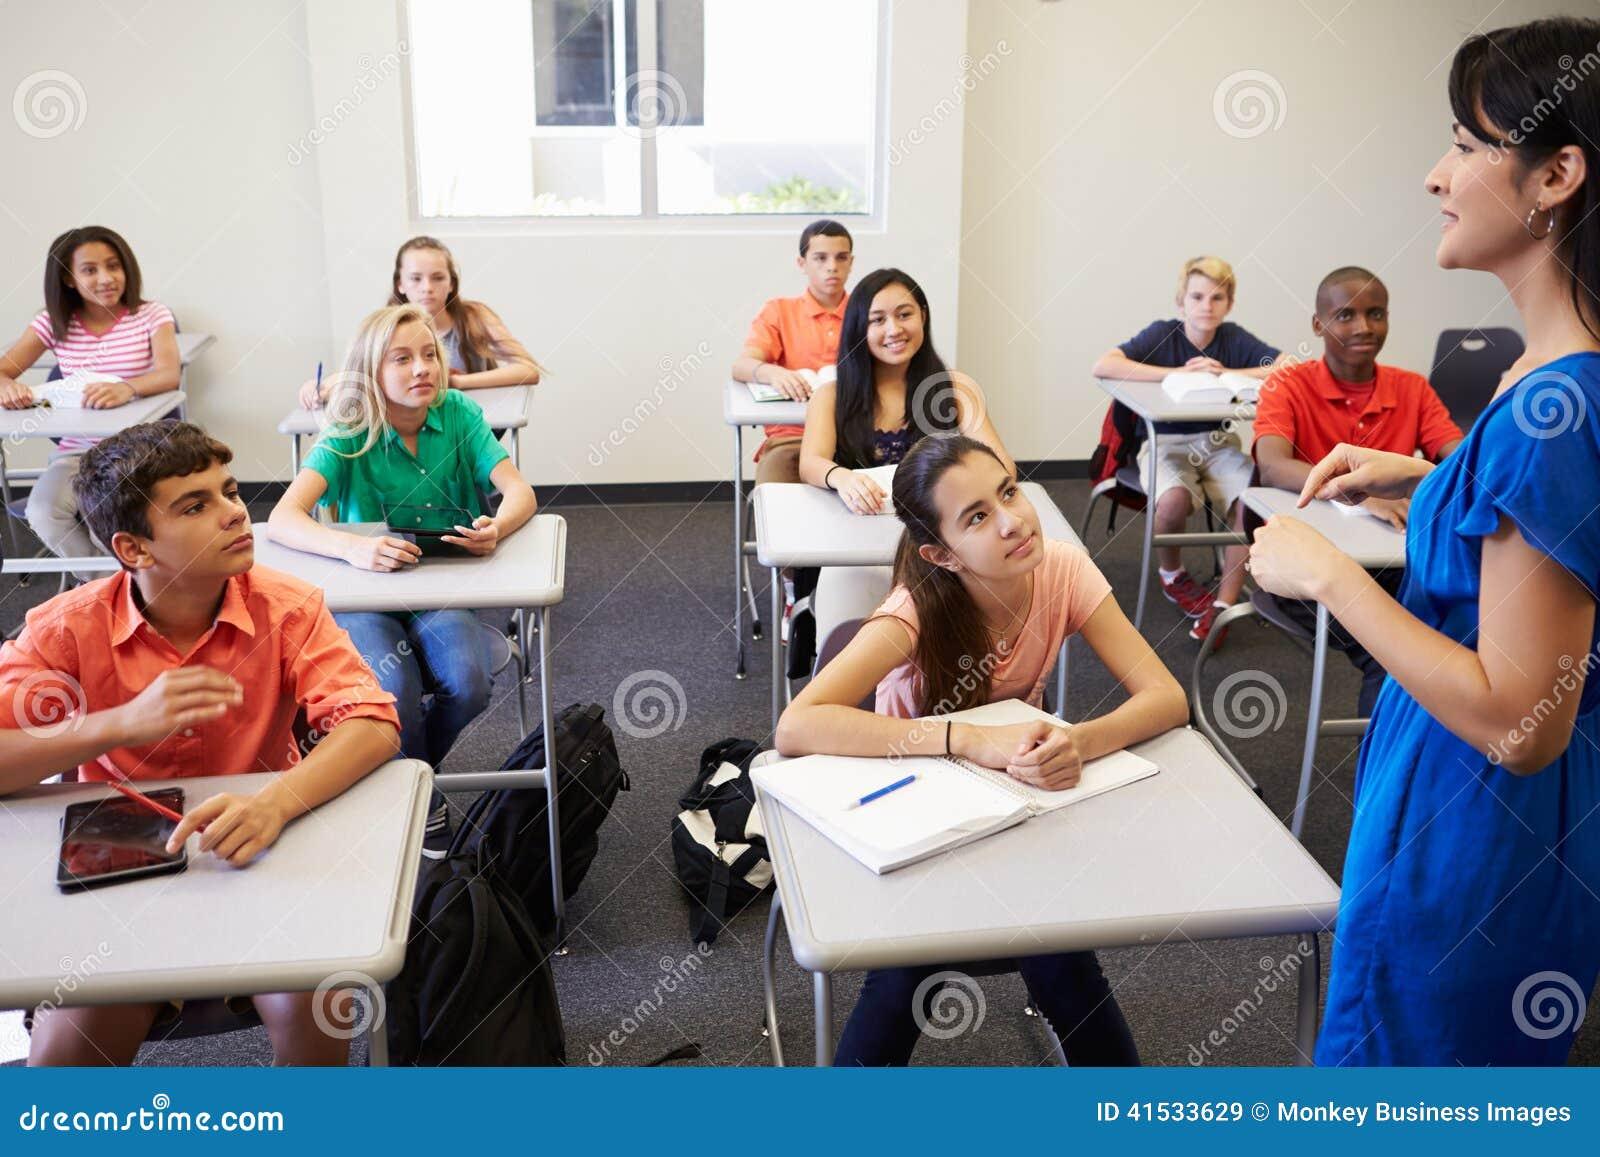 Classroom Presentation Ideas ~ Female high school teacher taking class stock photo